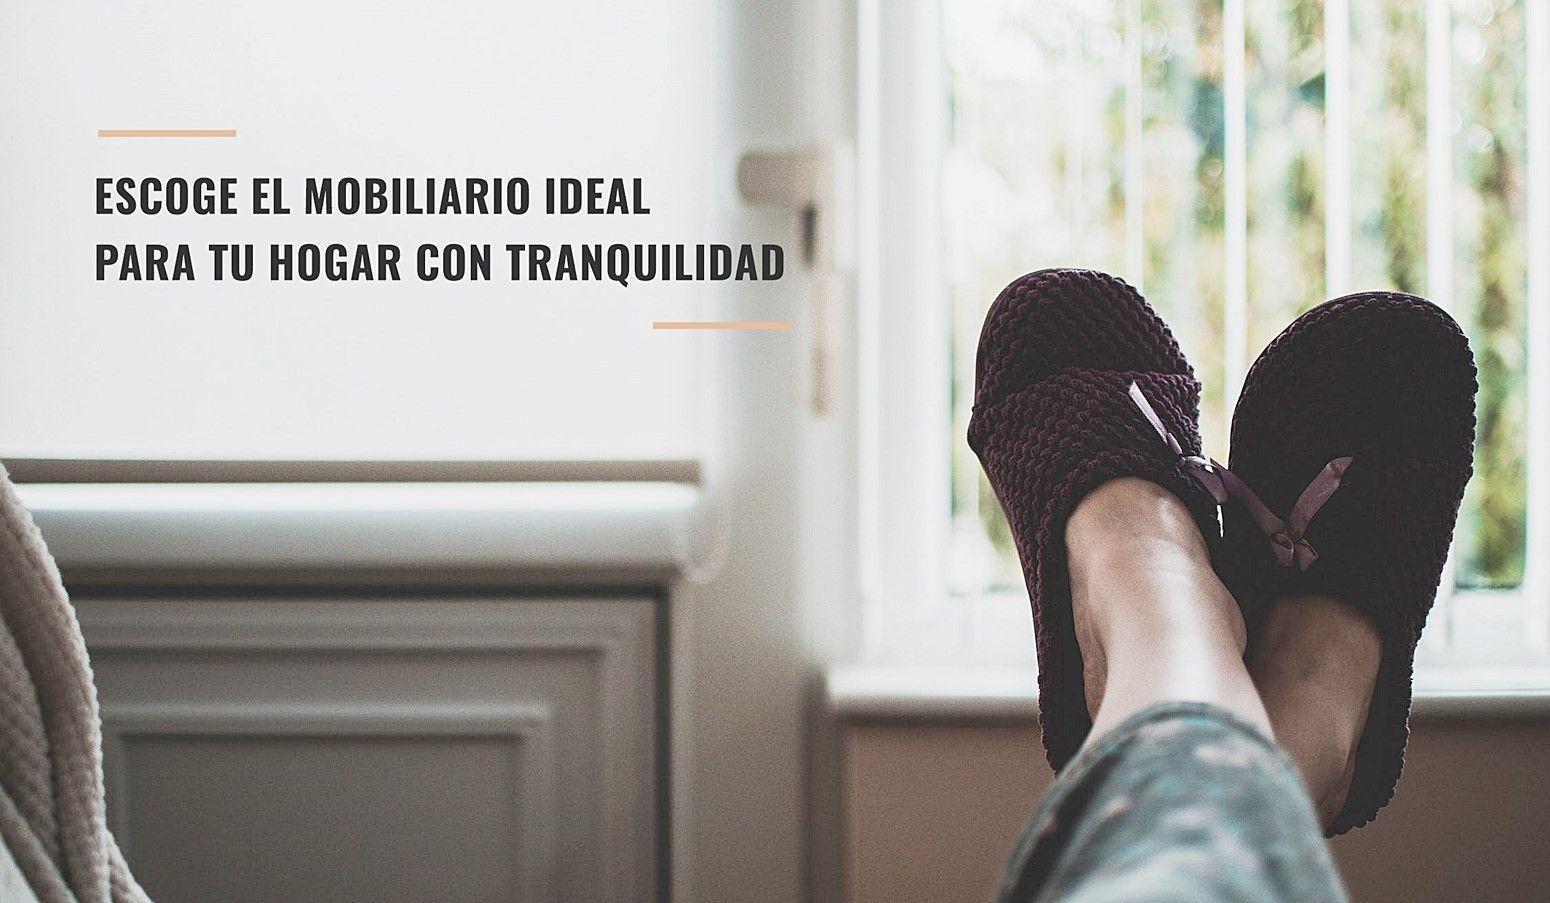 Aspectos imprescindibles para escoger tus muebles con tranquilidad, tips Interriorismo online Ana Utrilla @Utrillanais